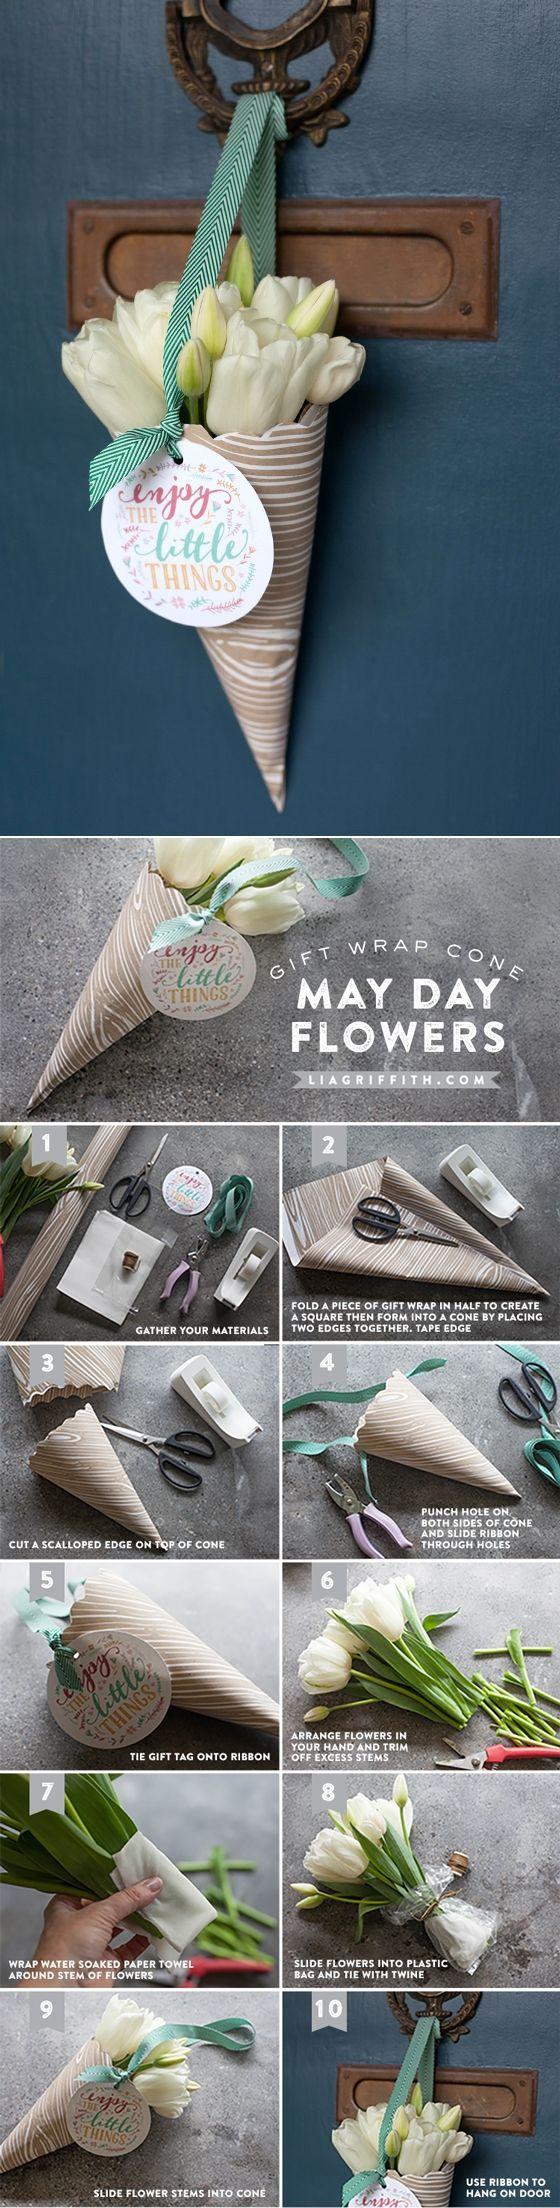 #Maydaybasket #diy #freeprintable at www.LiaGriffith.com